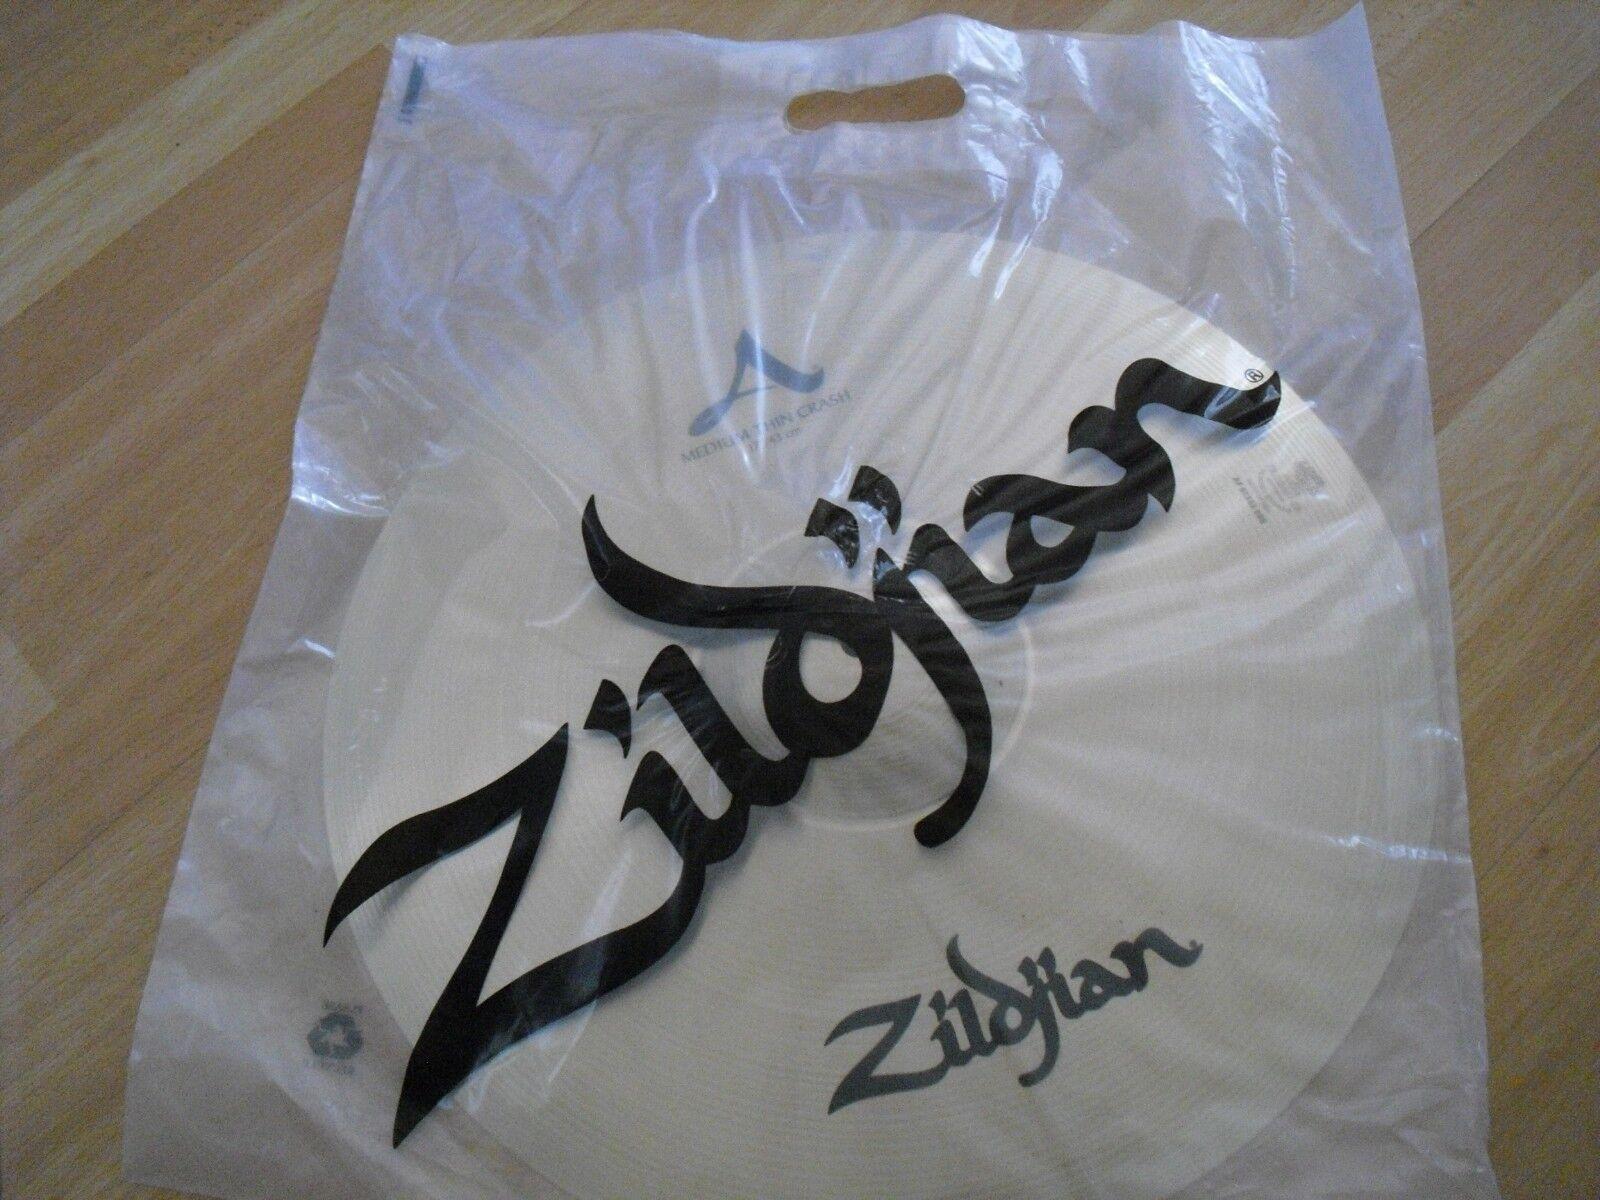 17  Avedis Zildjian Medium Thin Crash Cymbal 1295g BARELY USED